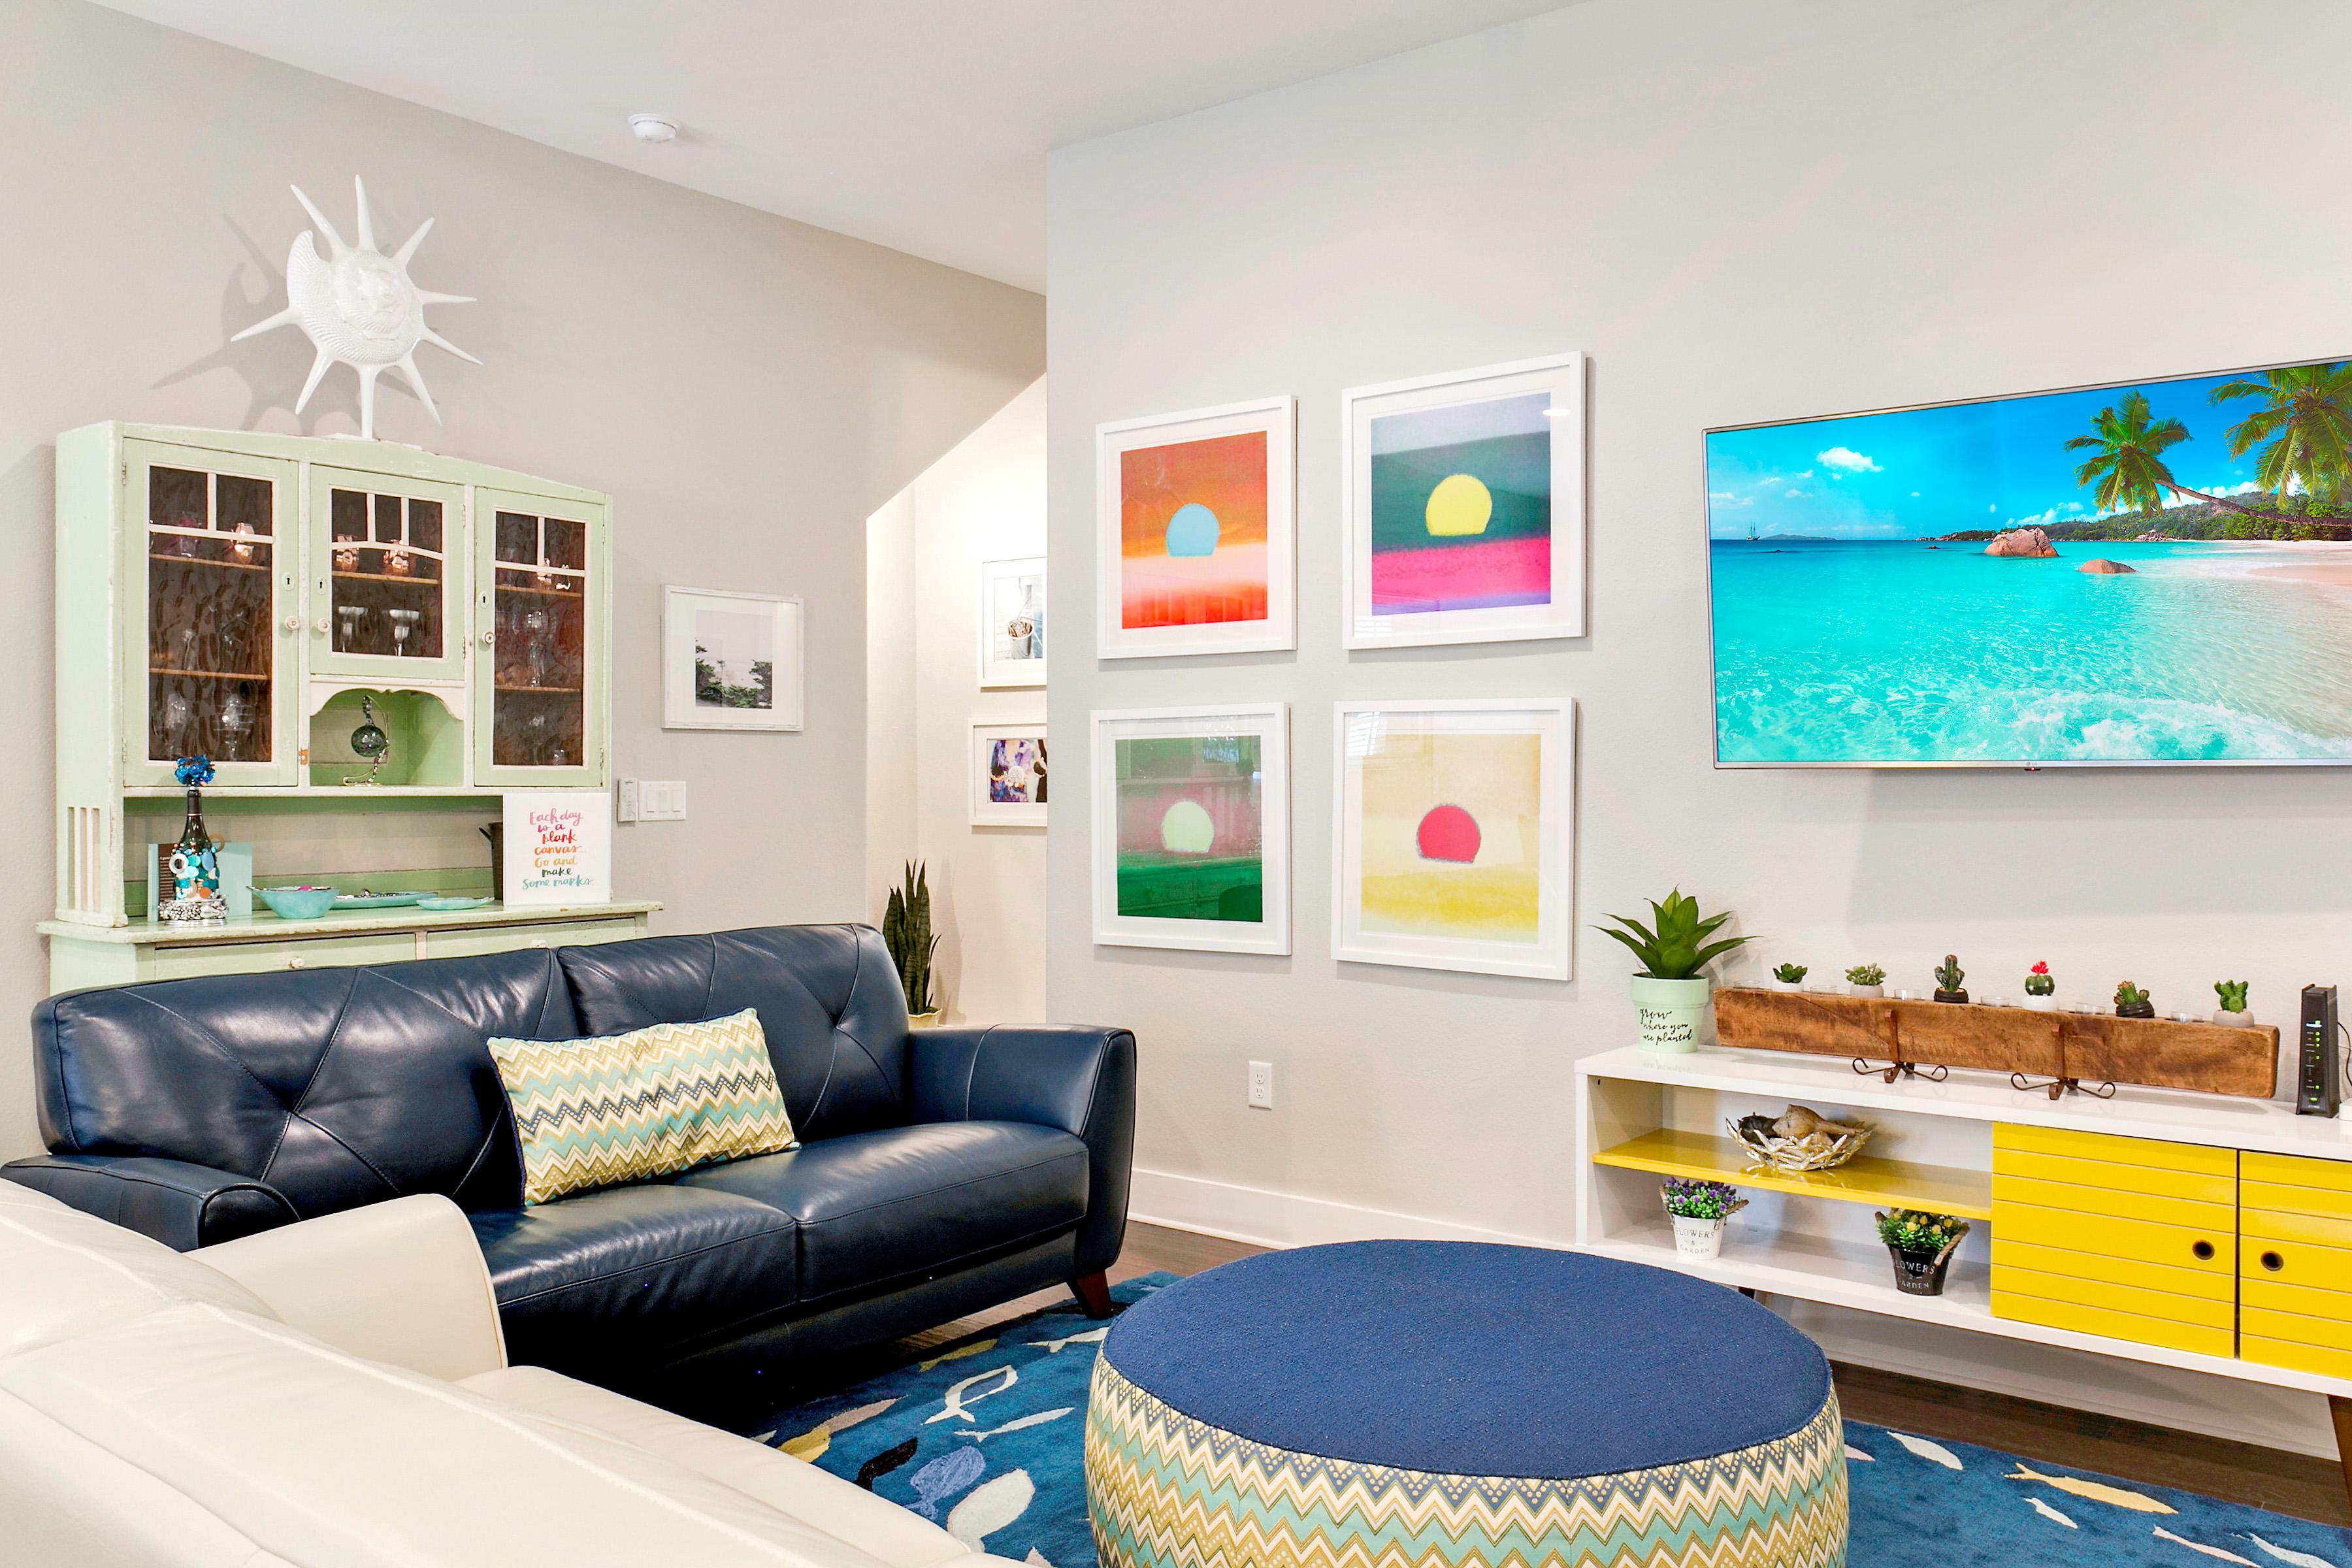 Port Aransas TX Vacation Rental Beach-inspired decor adds